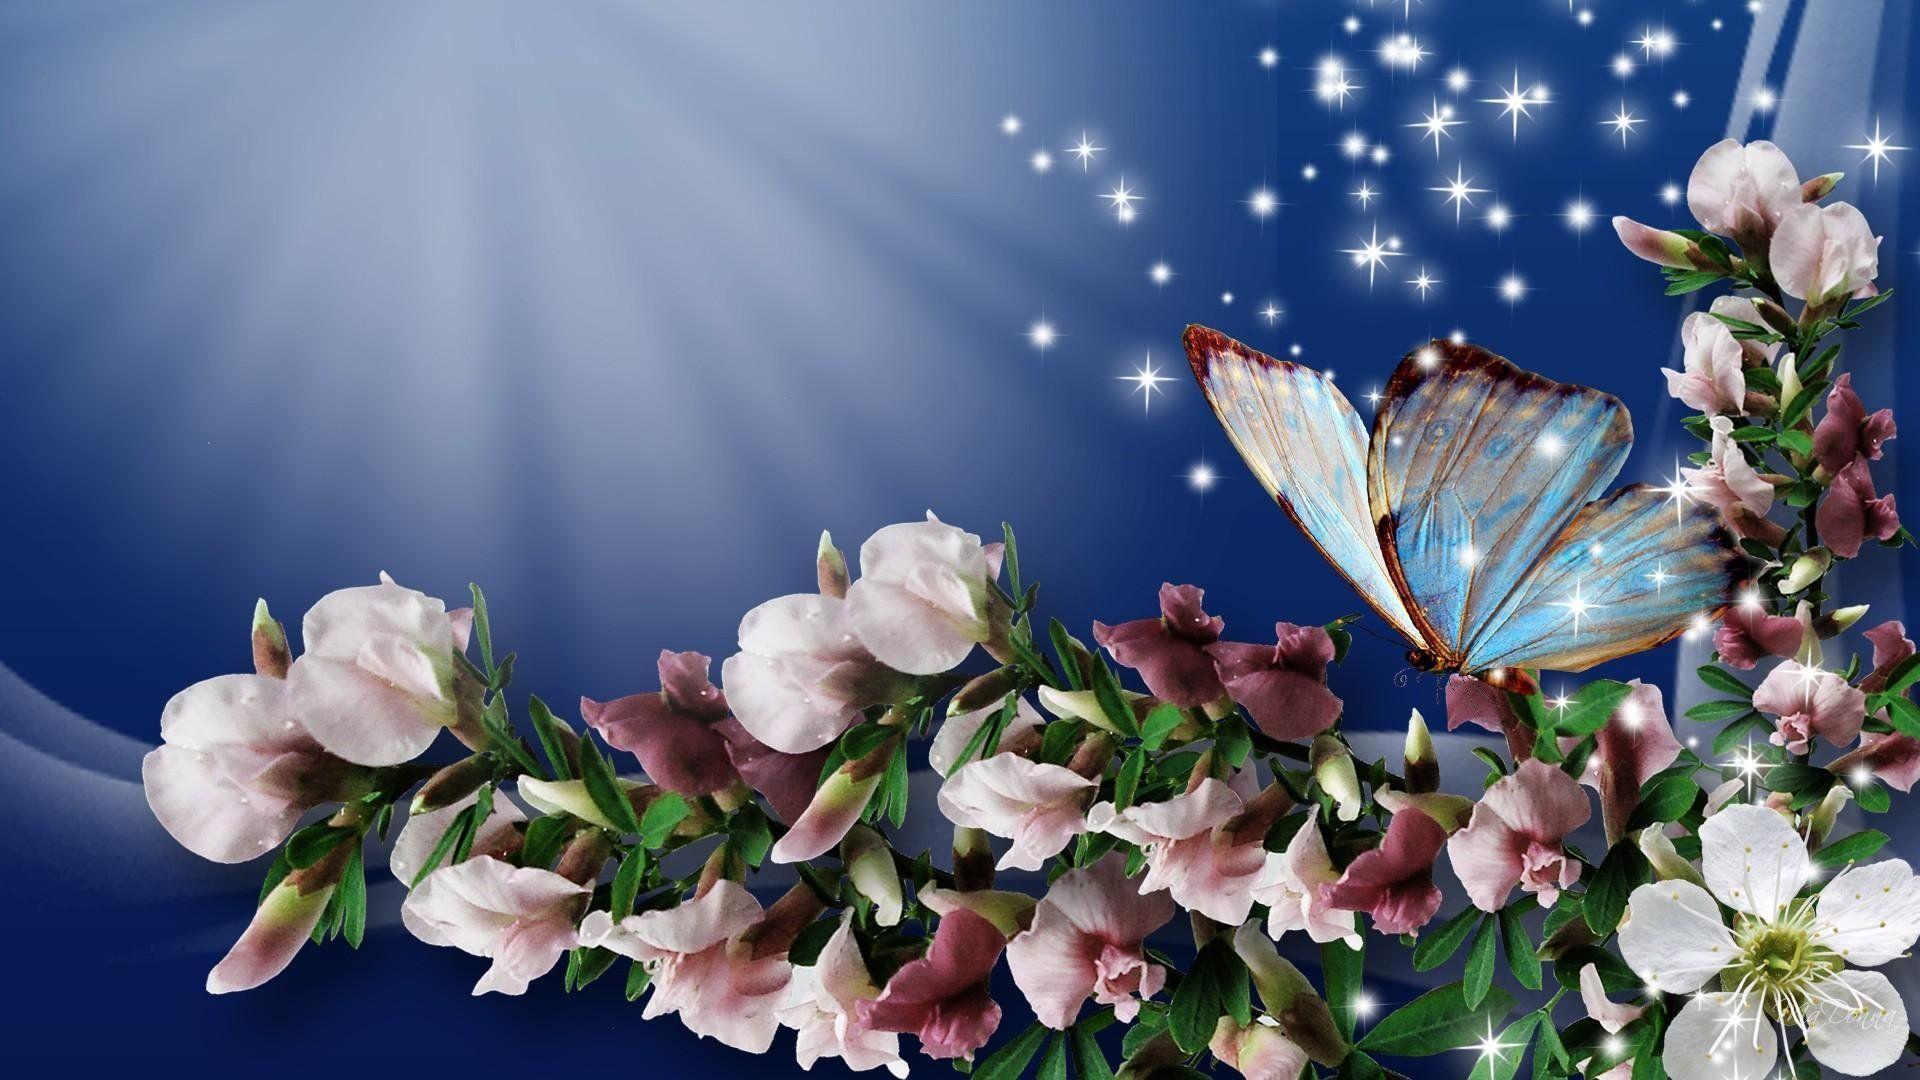 1920x1080 Stars and Butterflies hình nền